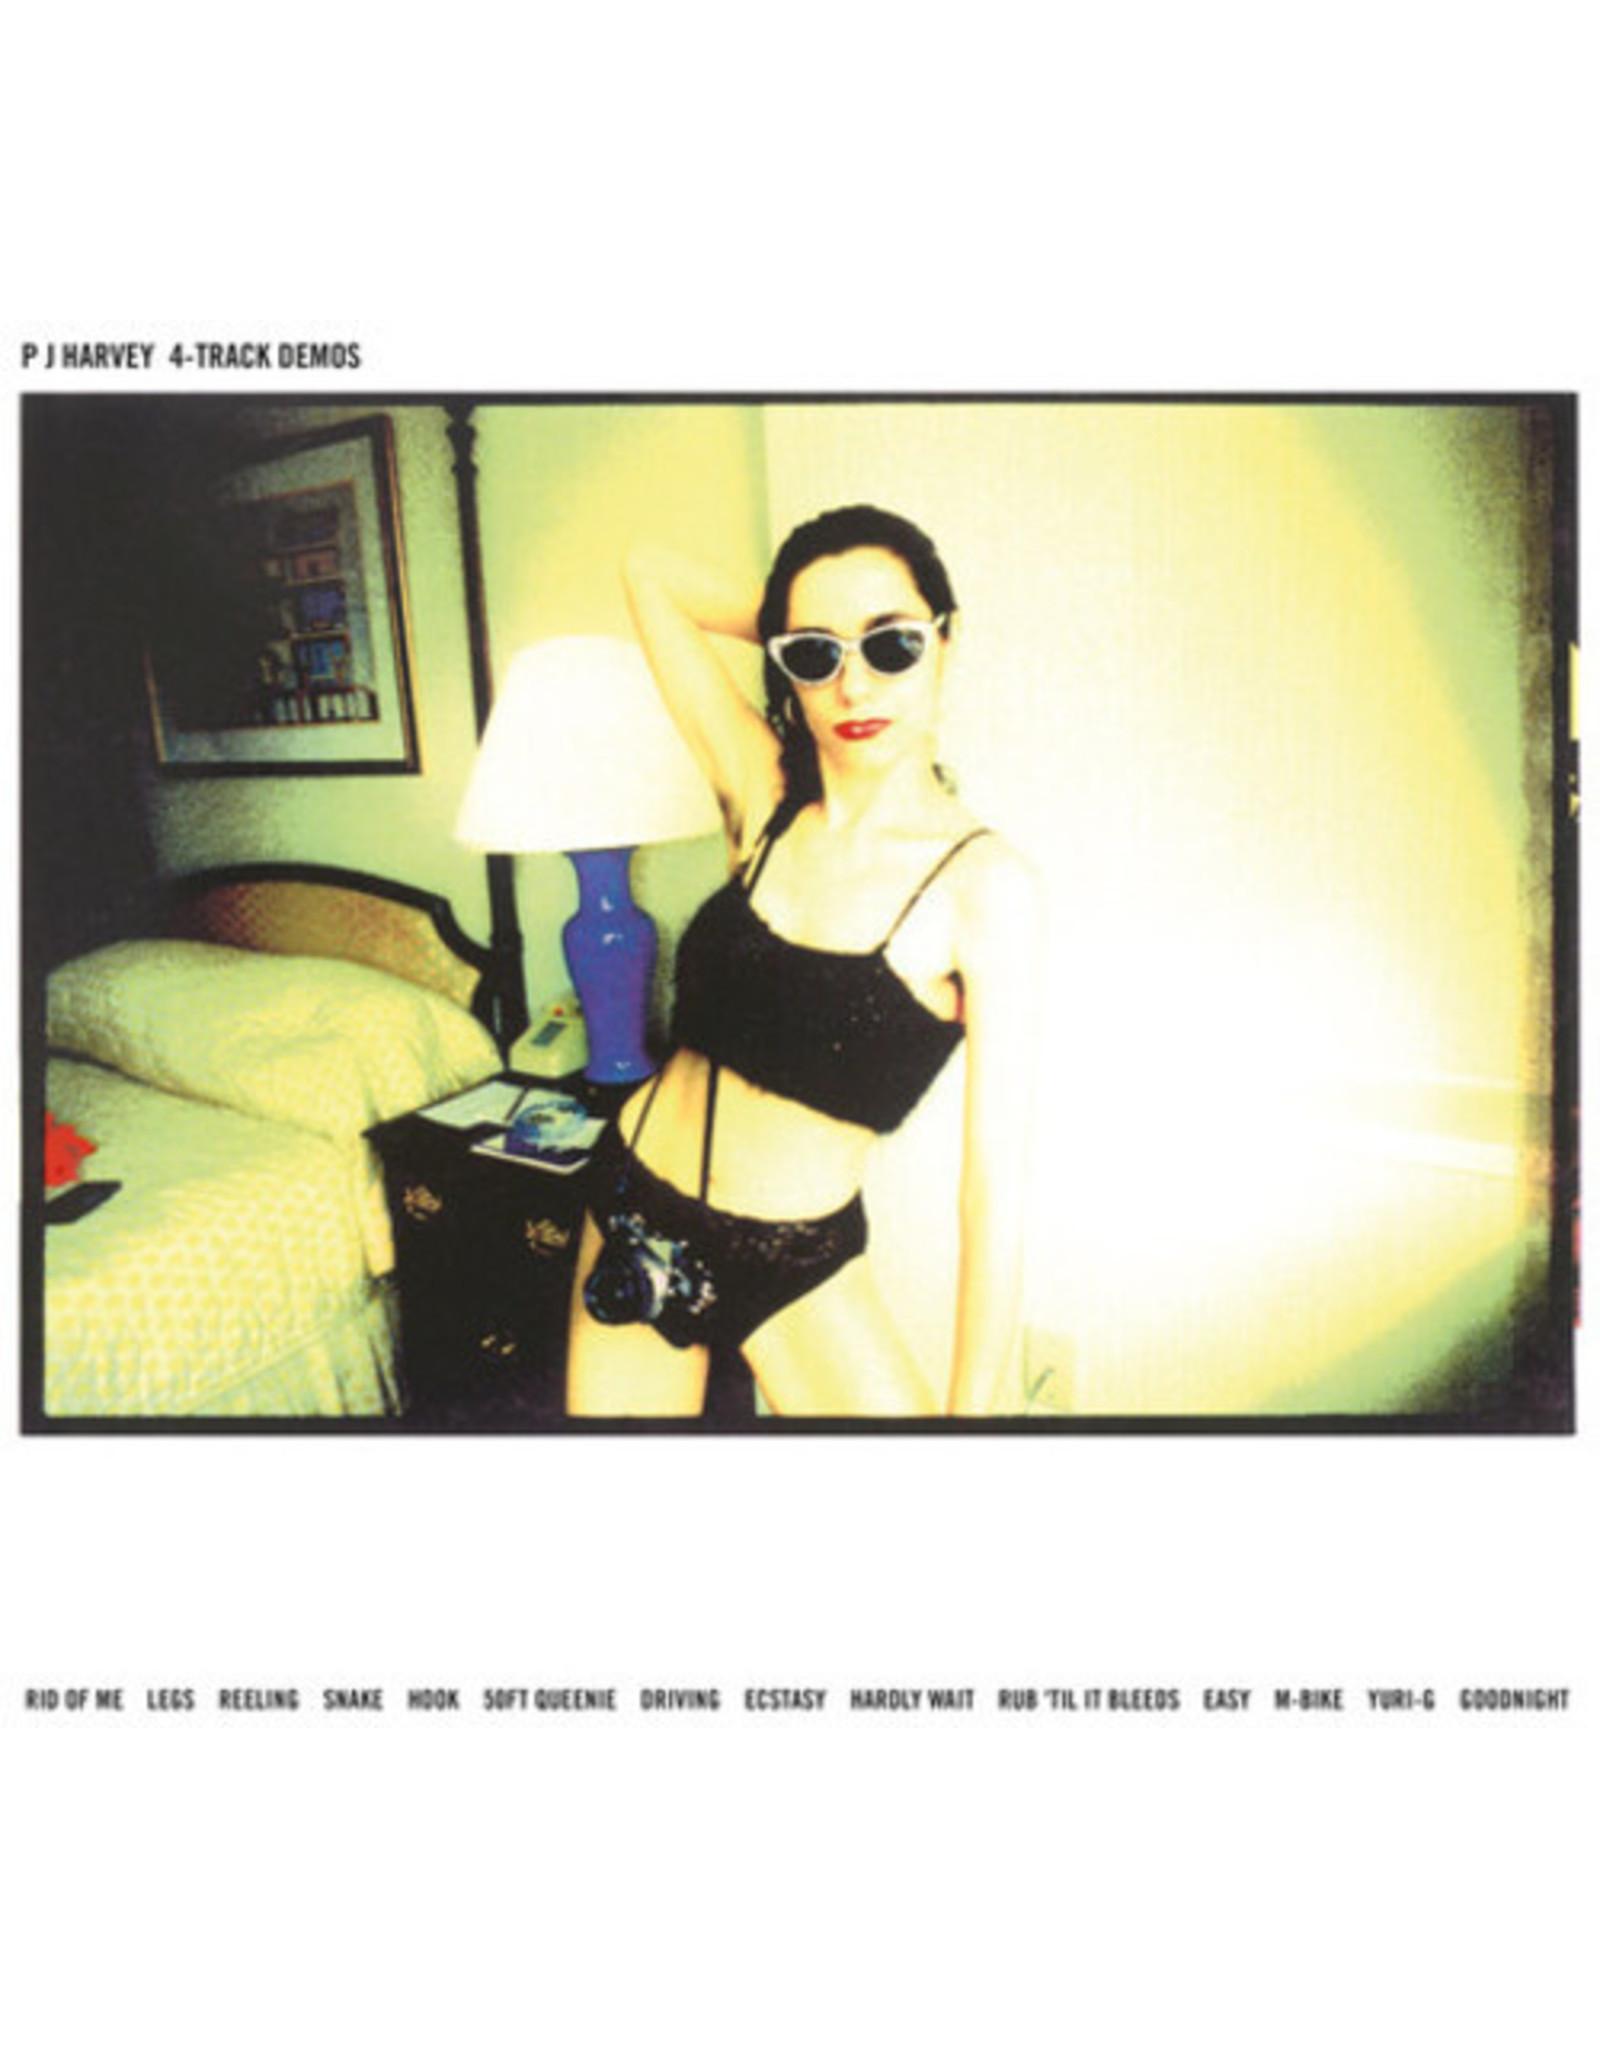 New Vinyl PJ Harvey - 4-Track Demos (Reissue) LP